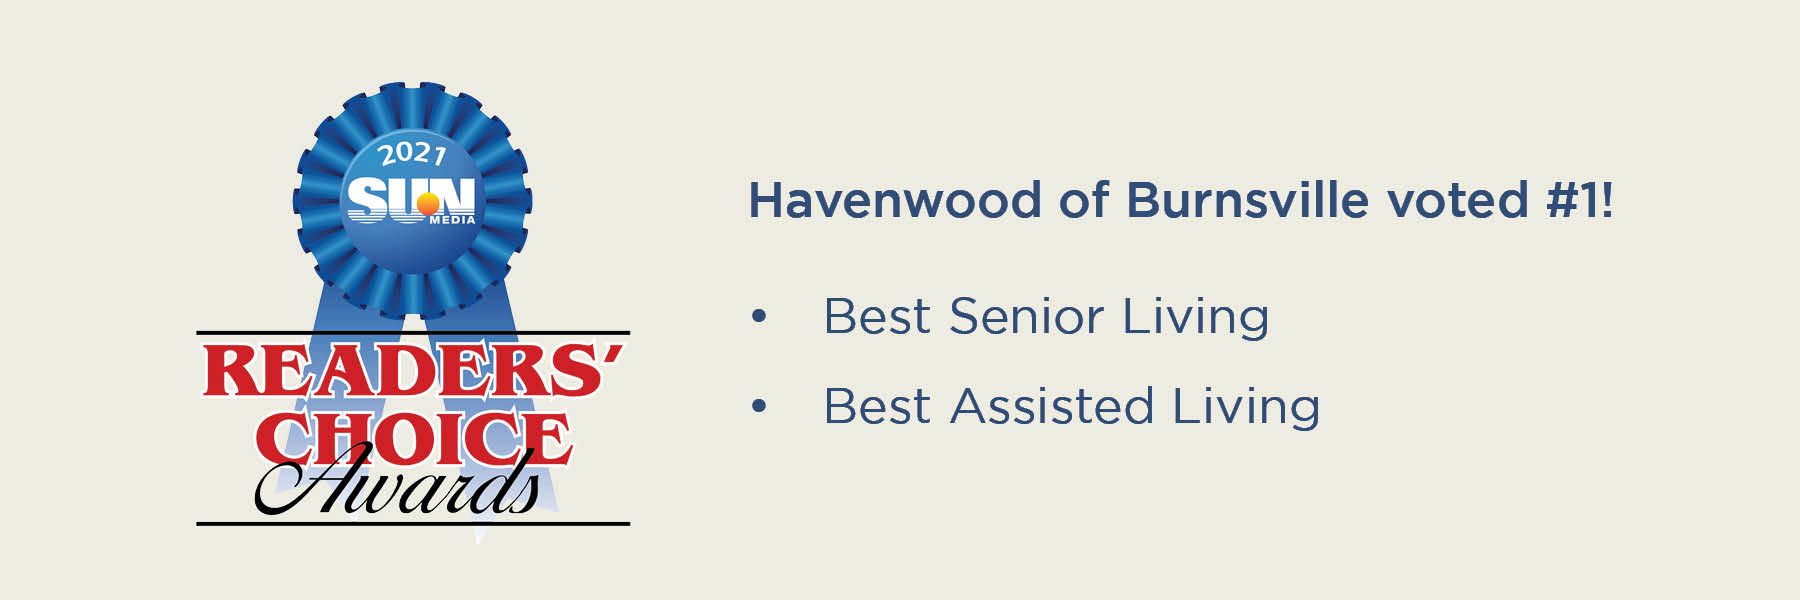 Havenwood of Burnsville voted #1